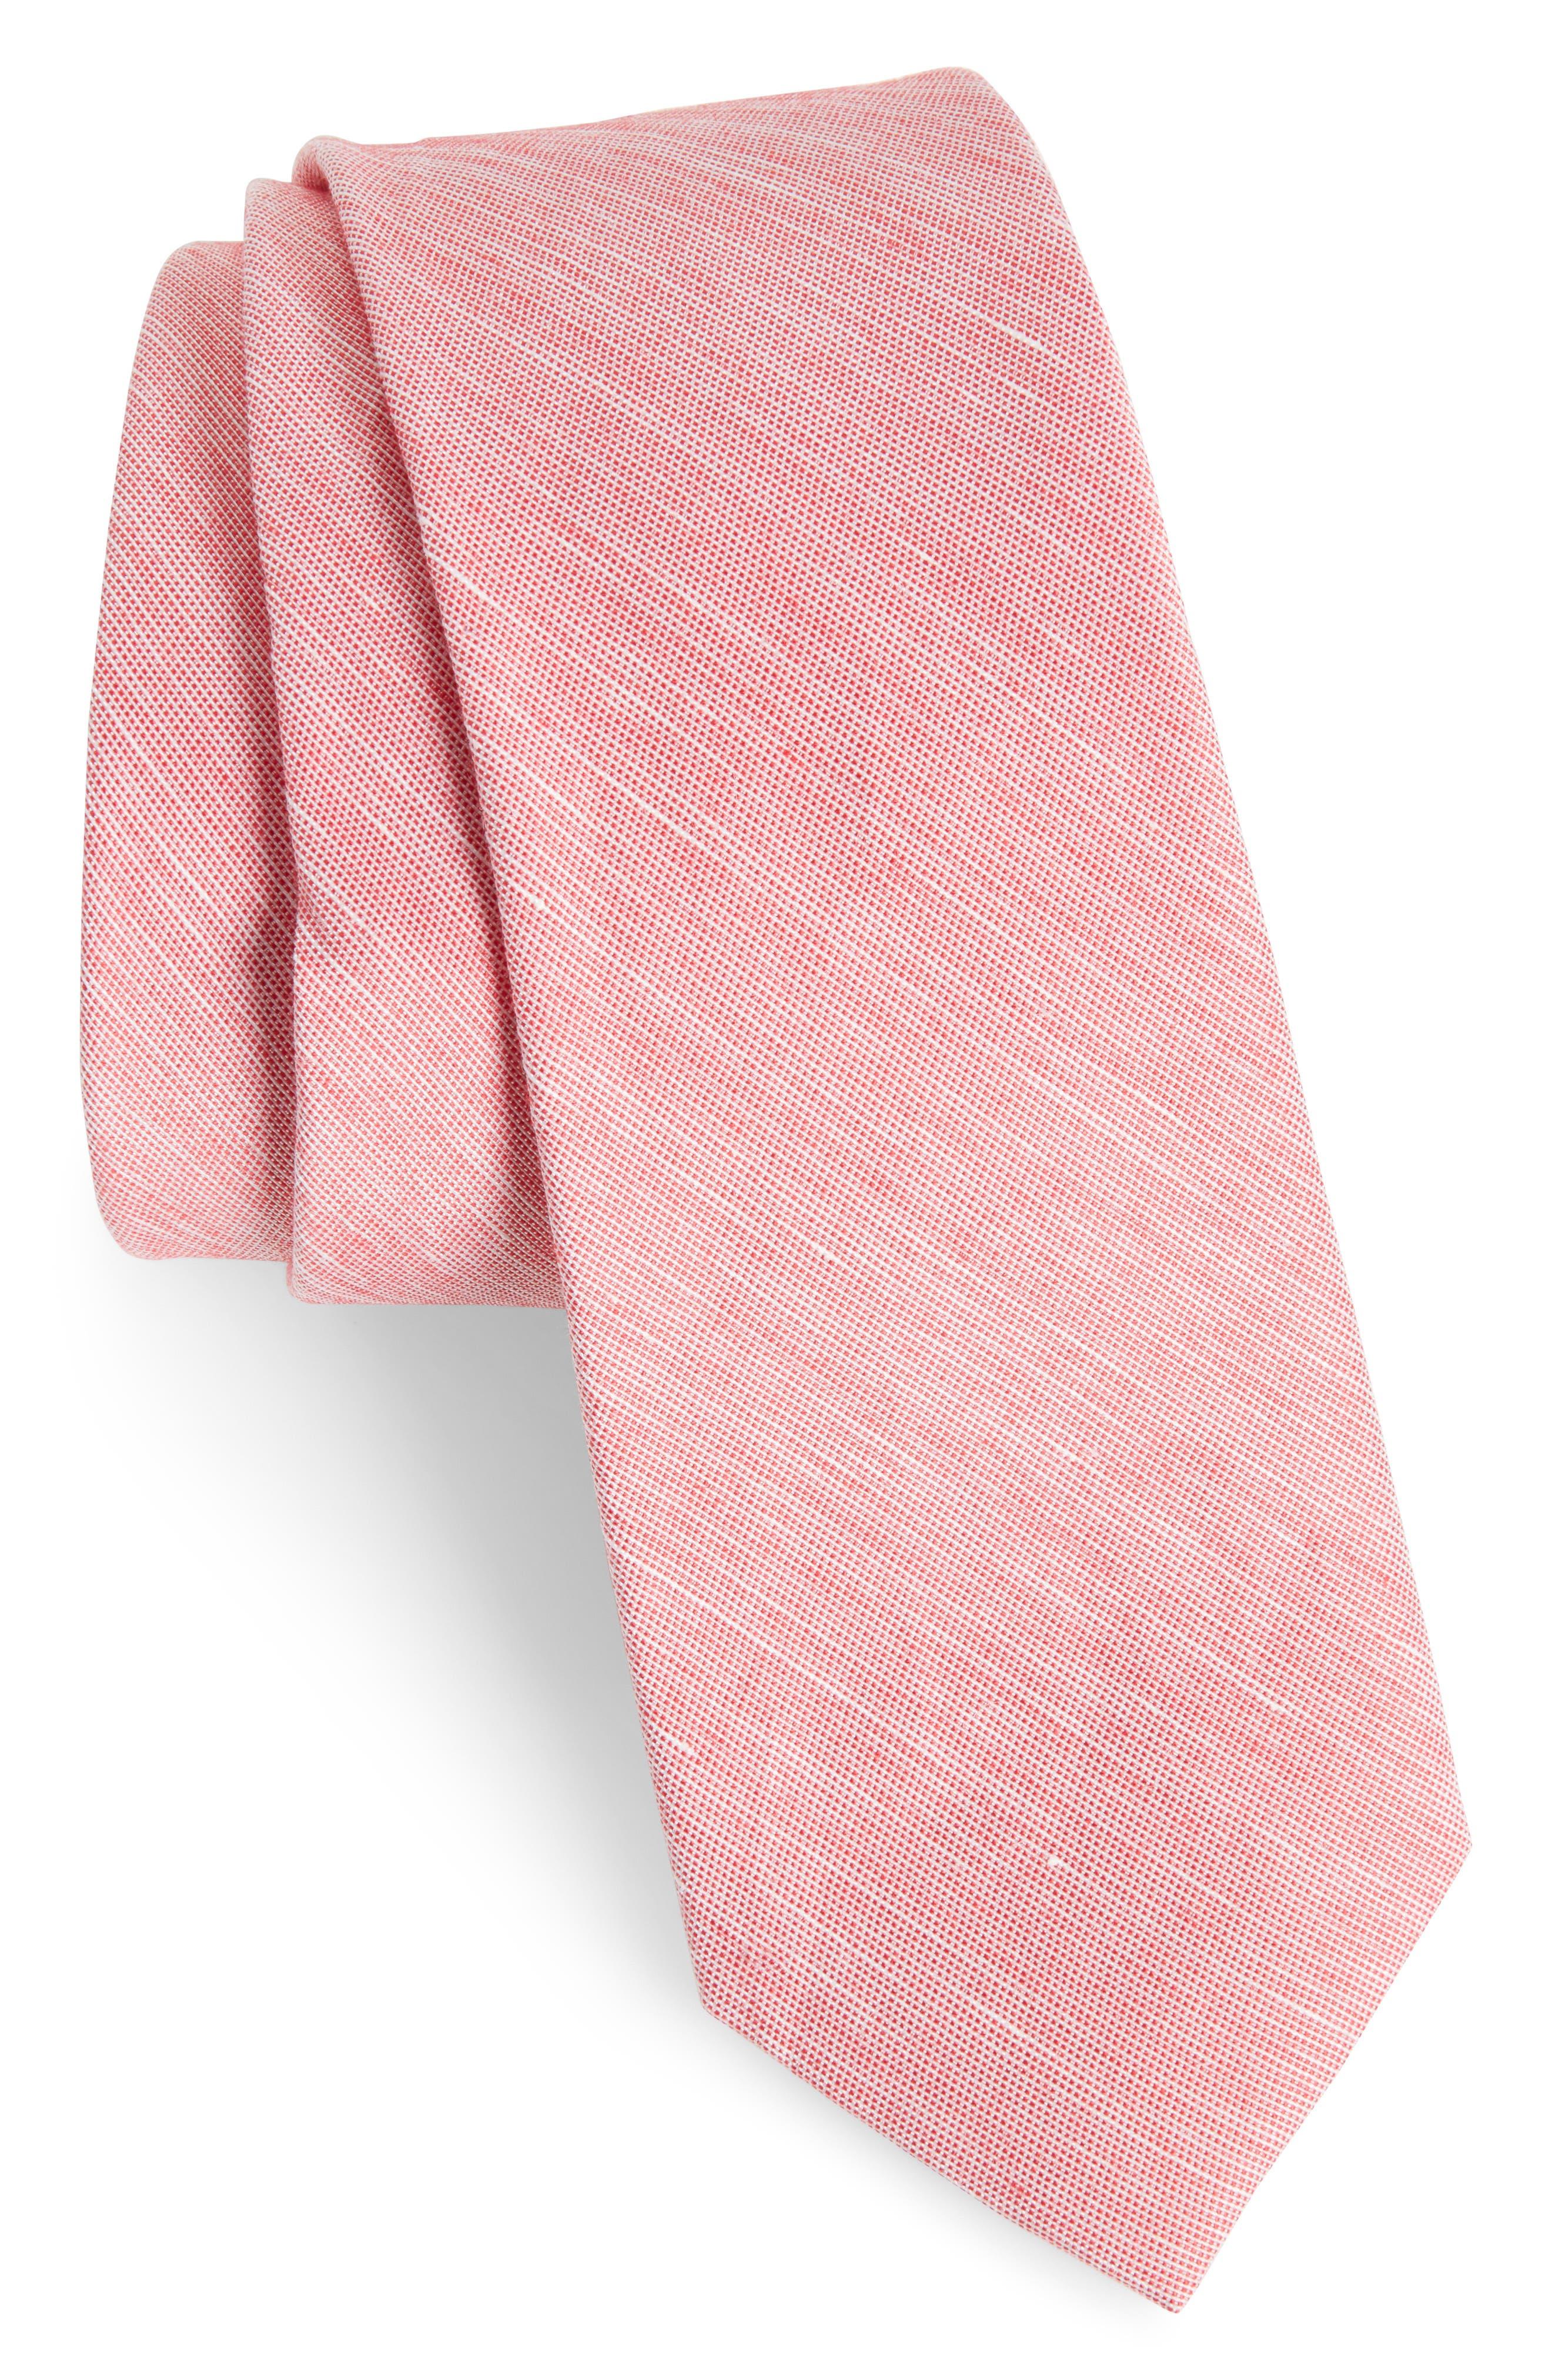 Adena Solid Silk Blend Skinny Tie,                         Main,                         color, Red